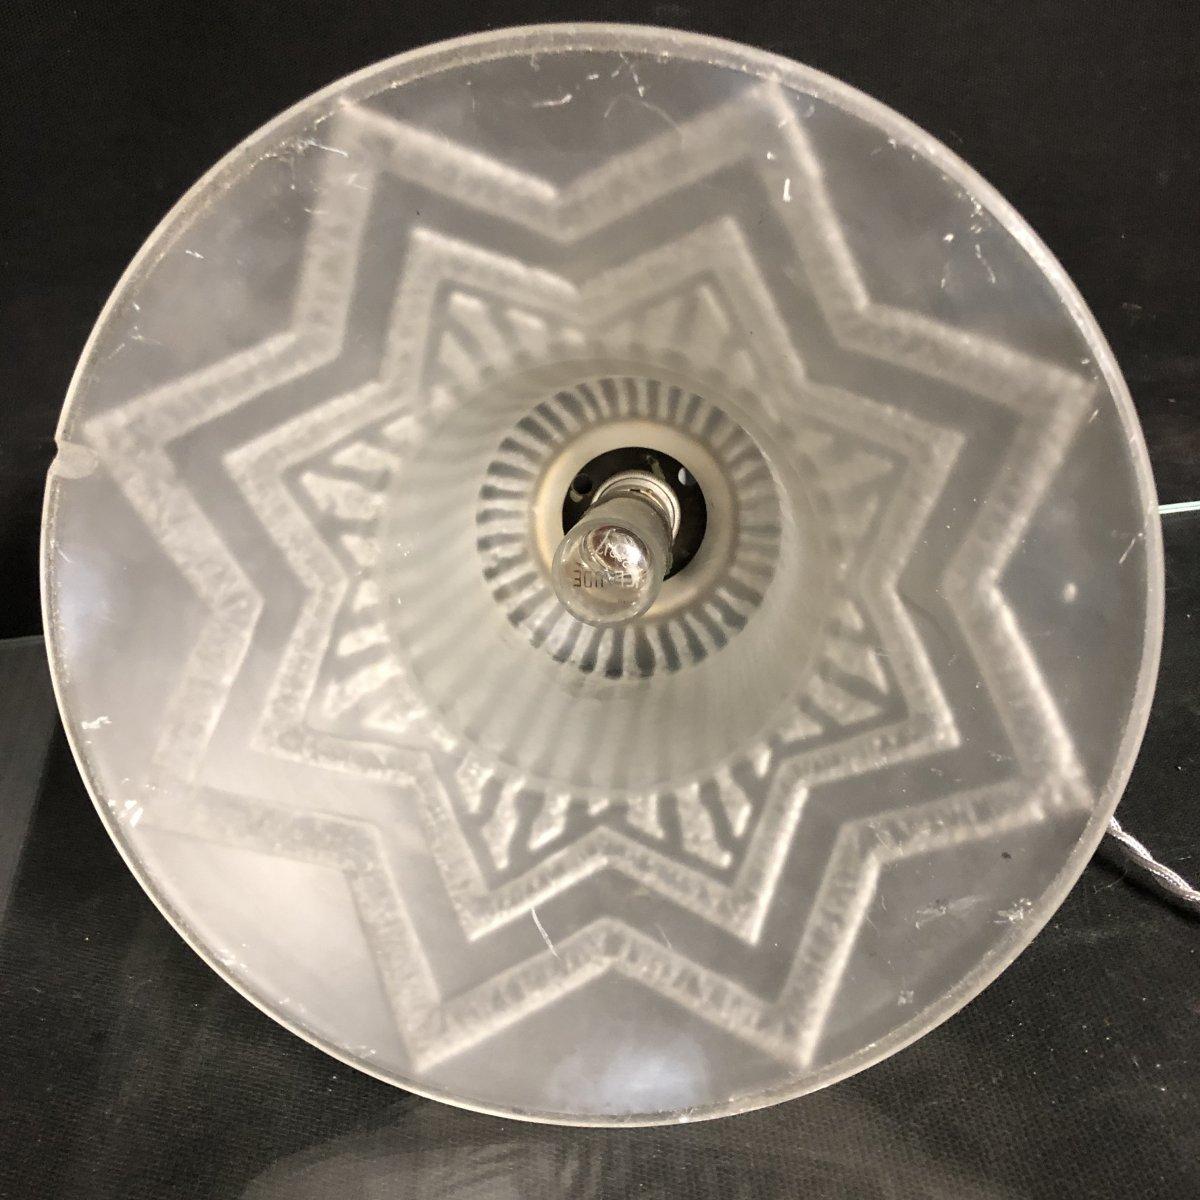 DAUM Nancy France GRANDE LAMPE OBUS 50,5 cm Art Deco 1930 EN TBE-photo-6